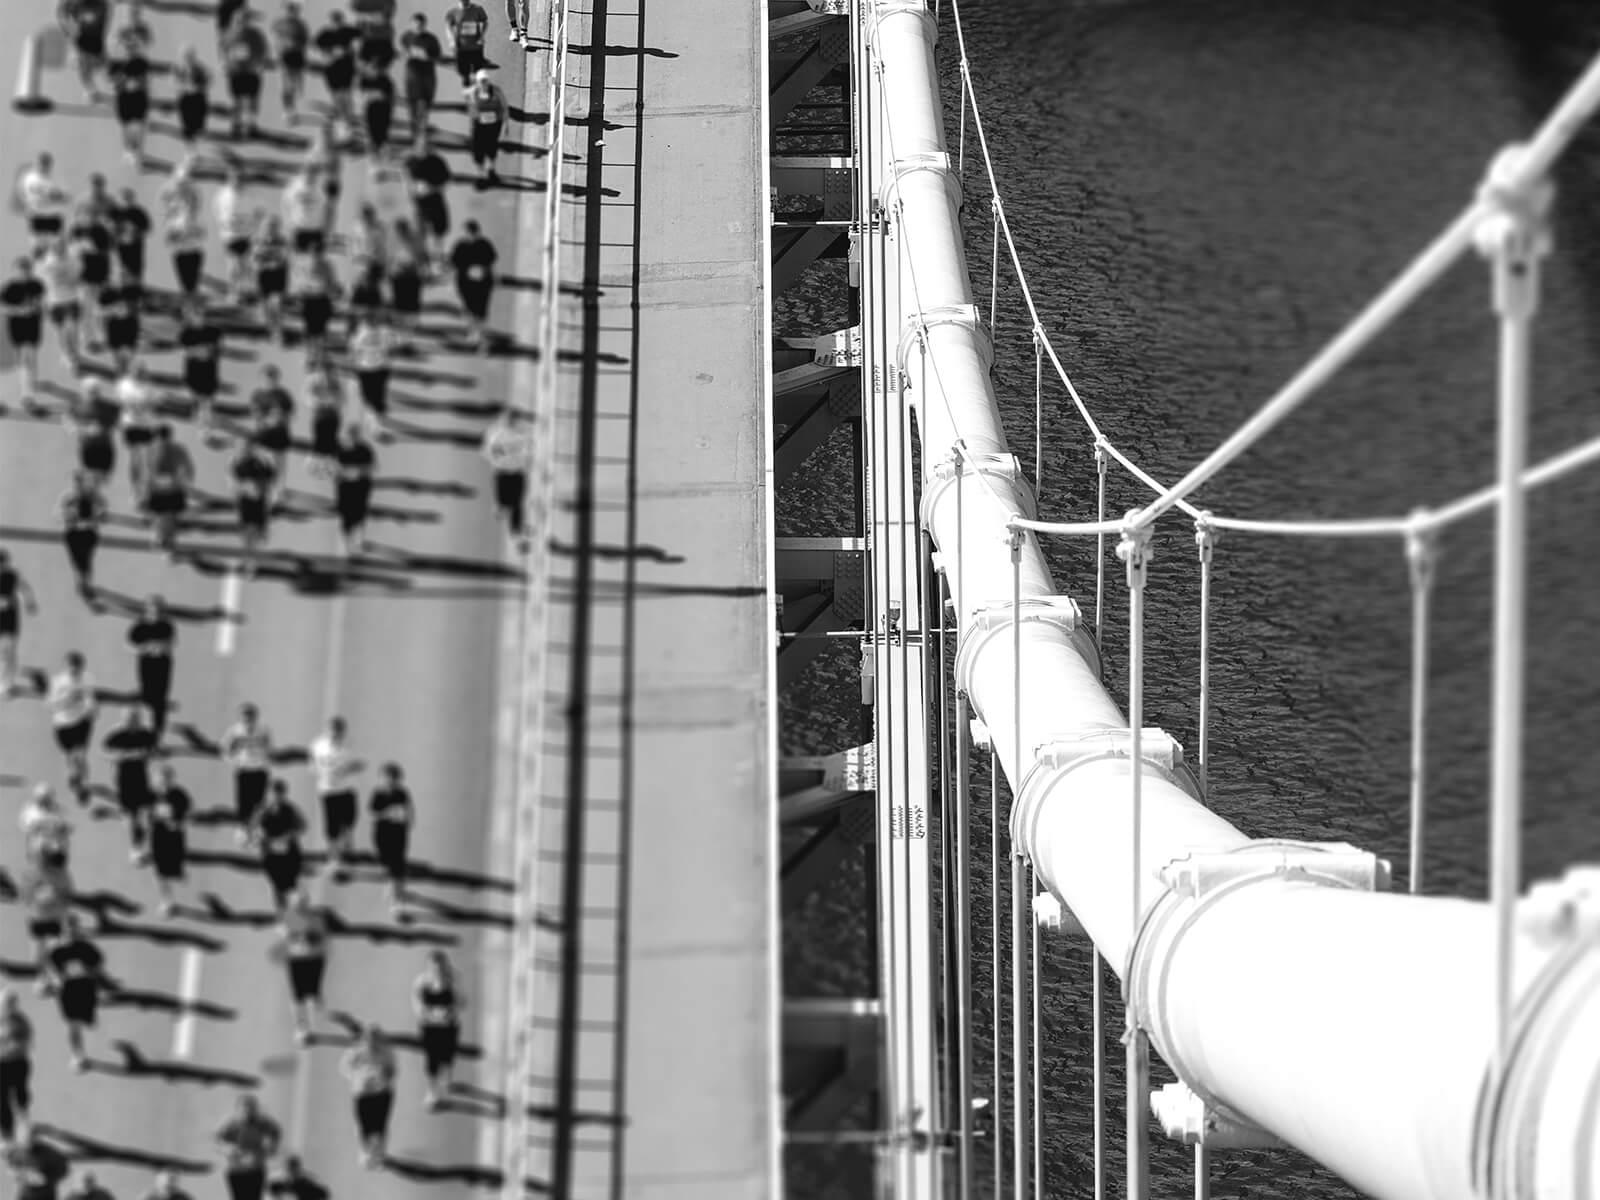 InfoSum Bridge - Crossing the industry chasm